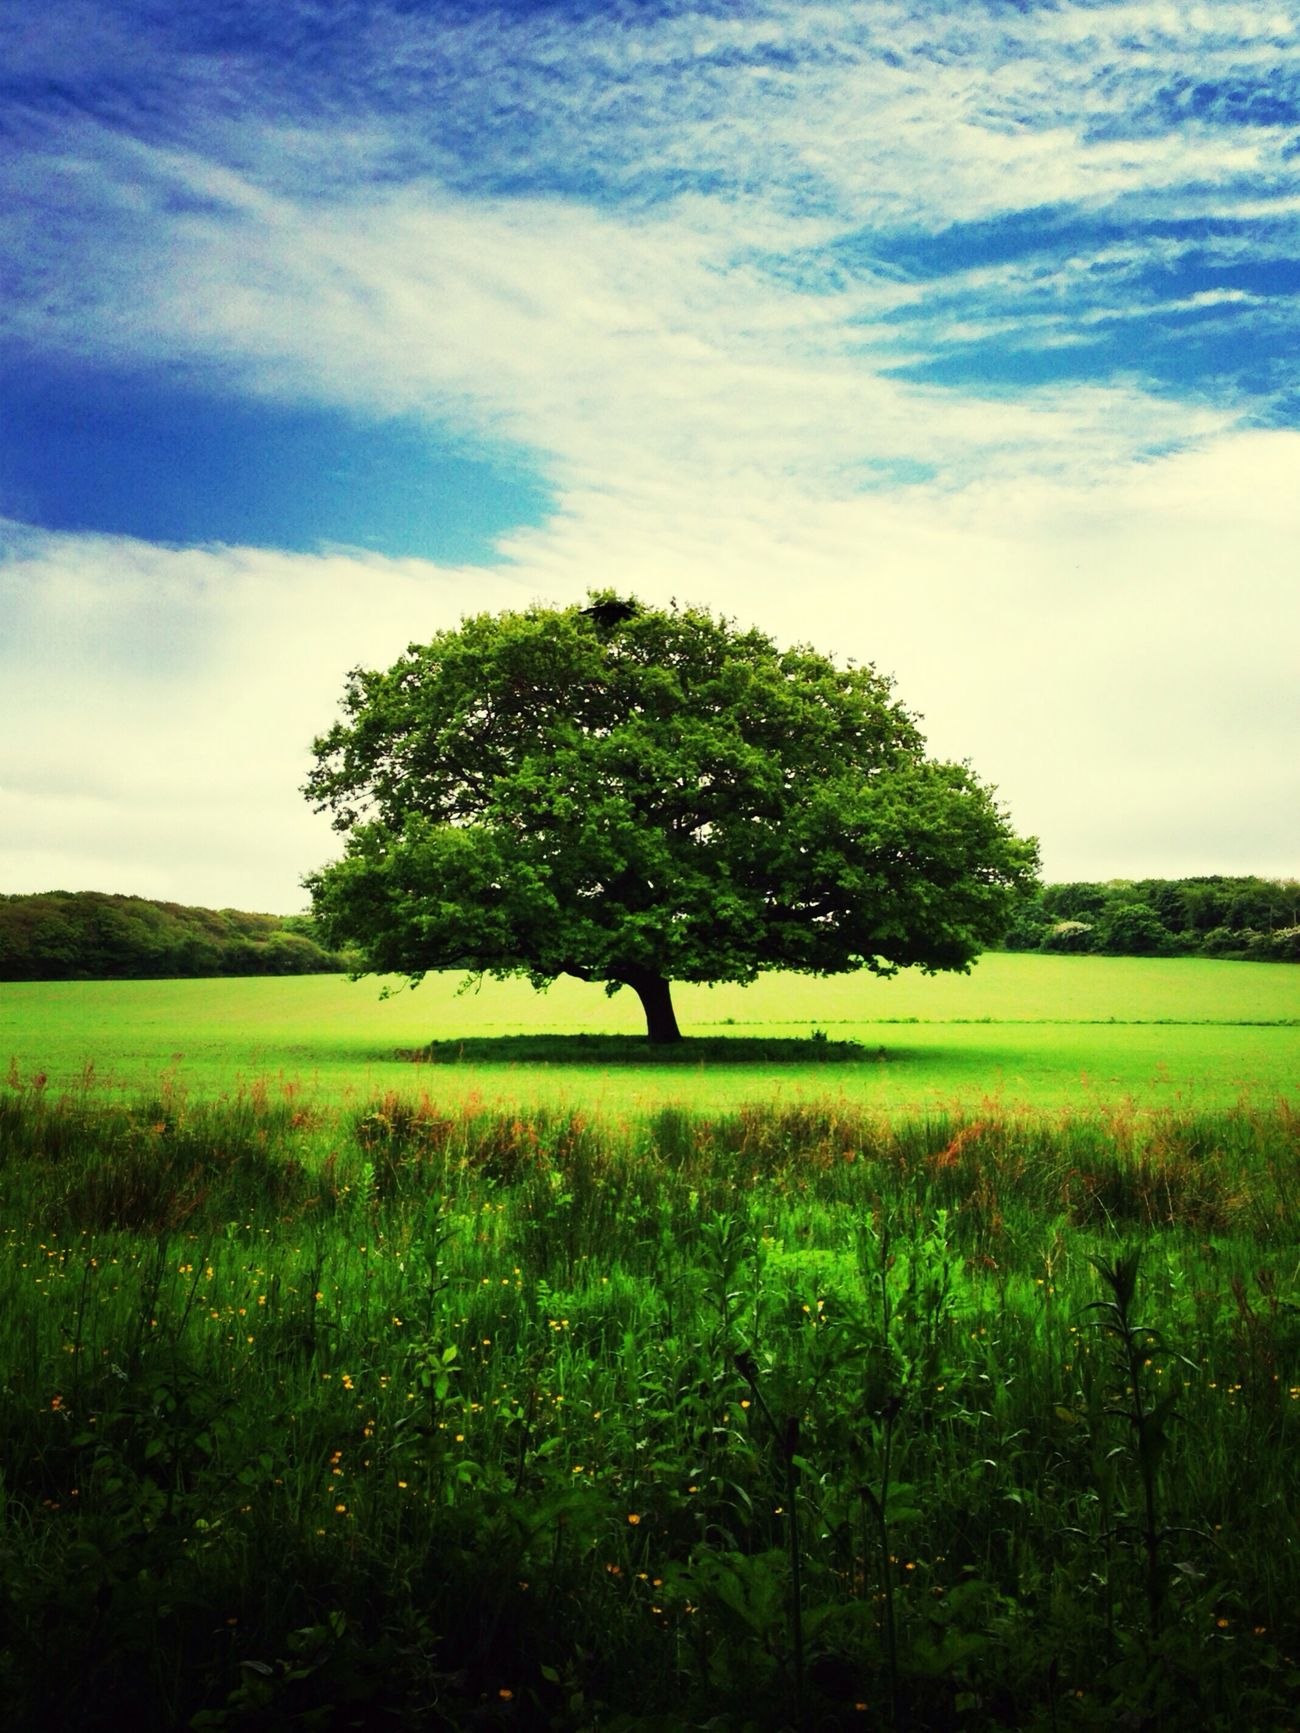 Green Earth The Environmentalist – 2014 EyeEm Awards NEM Landscapes NEM Green